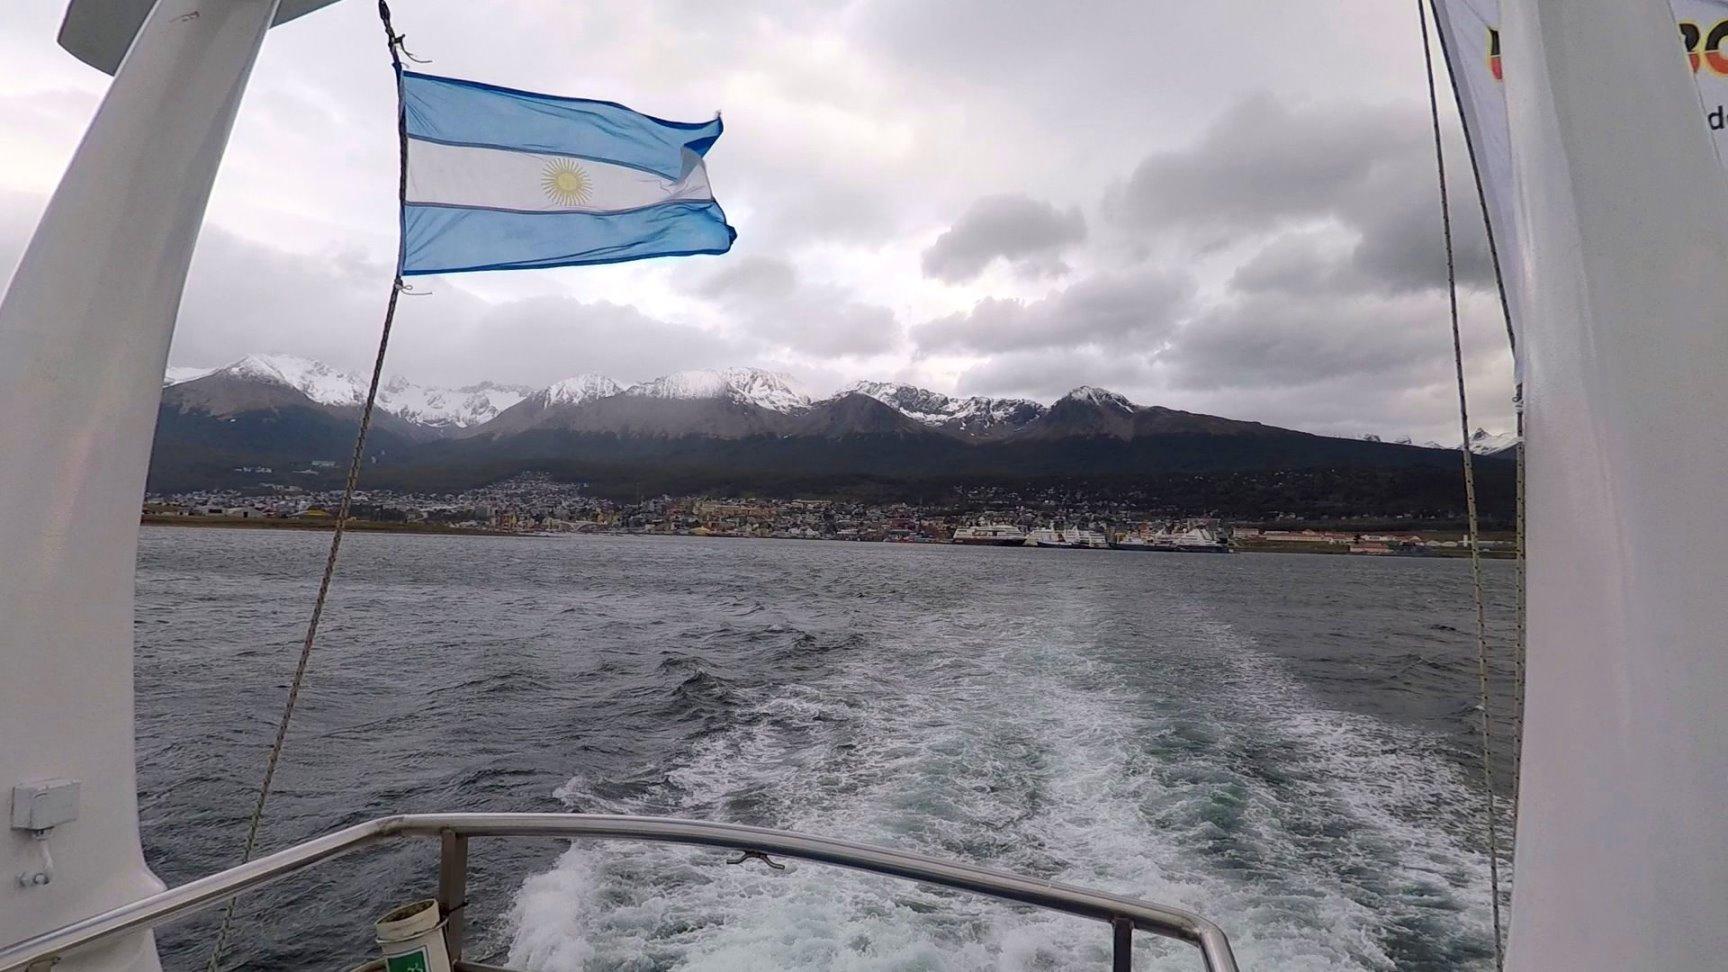 Wir lassen Ushuaia hinter uns